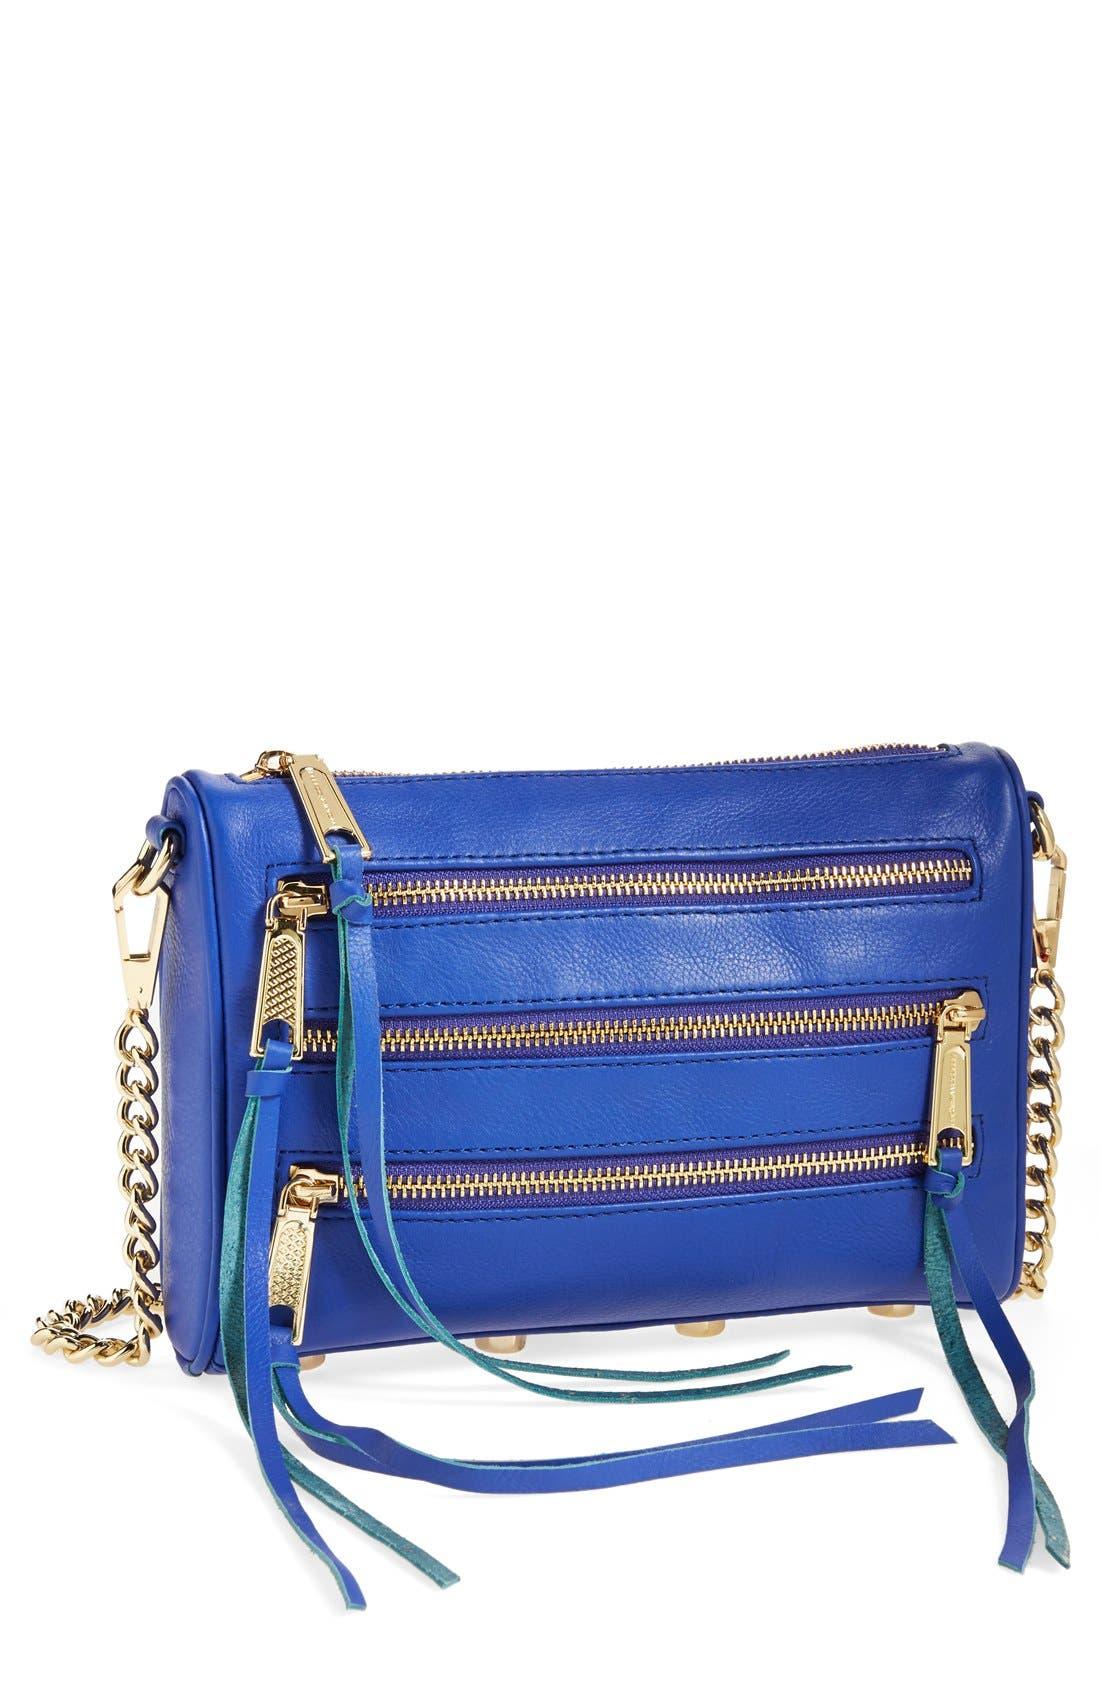 Main Image - Rebecca Minkoff 'Mini 5 Zip' Convertible Crossbody Bag